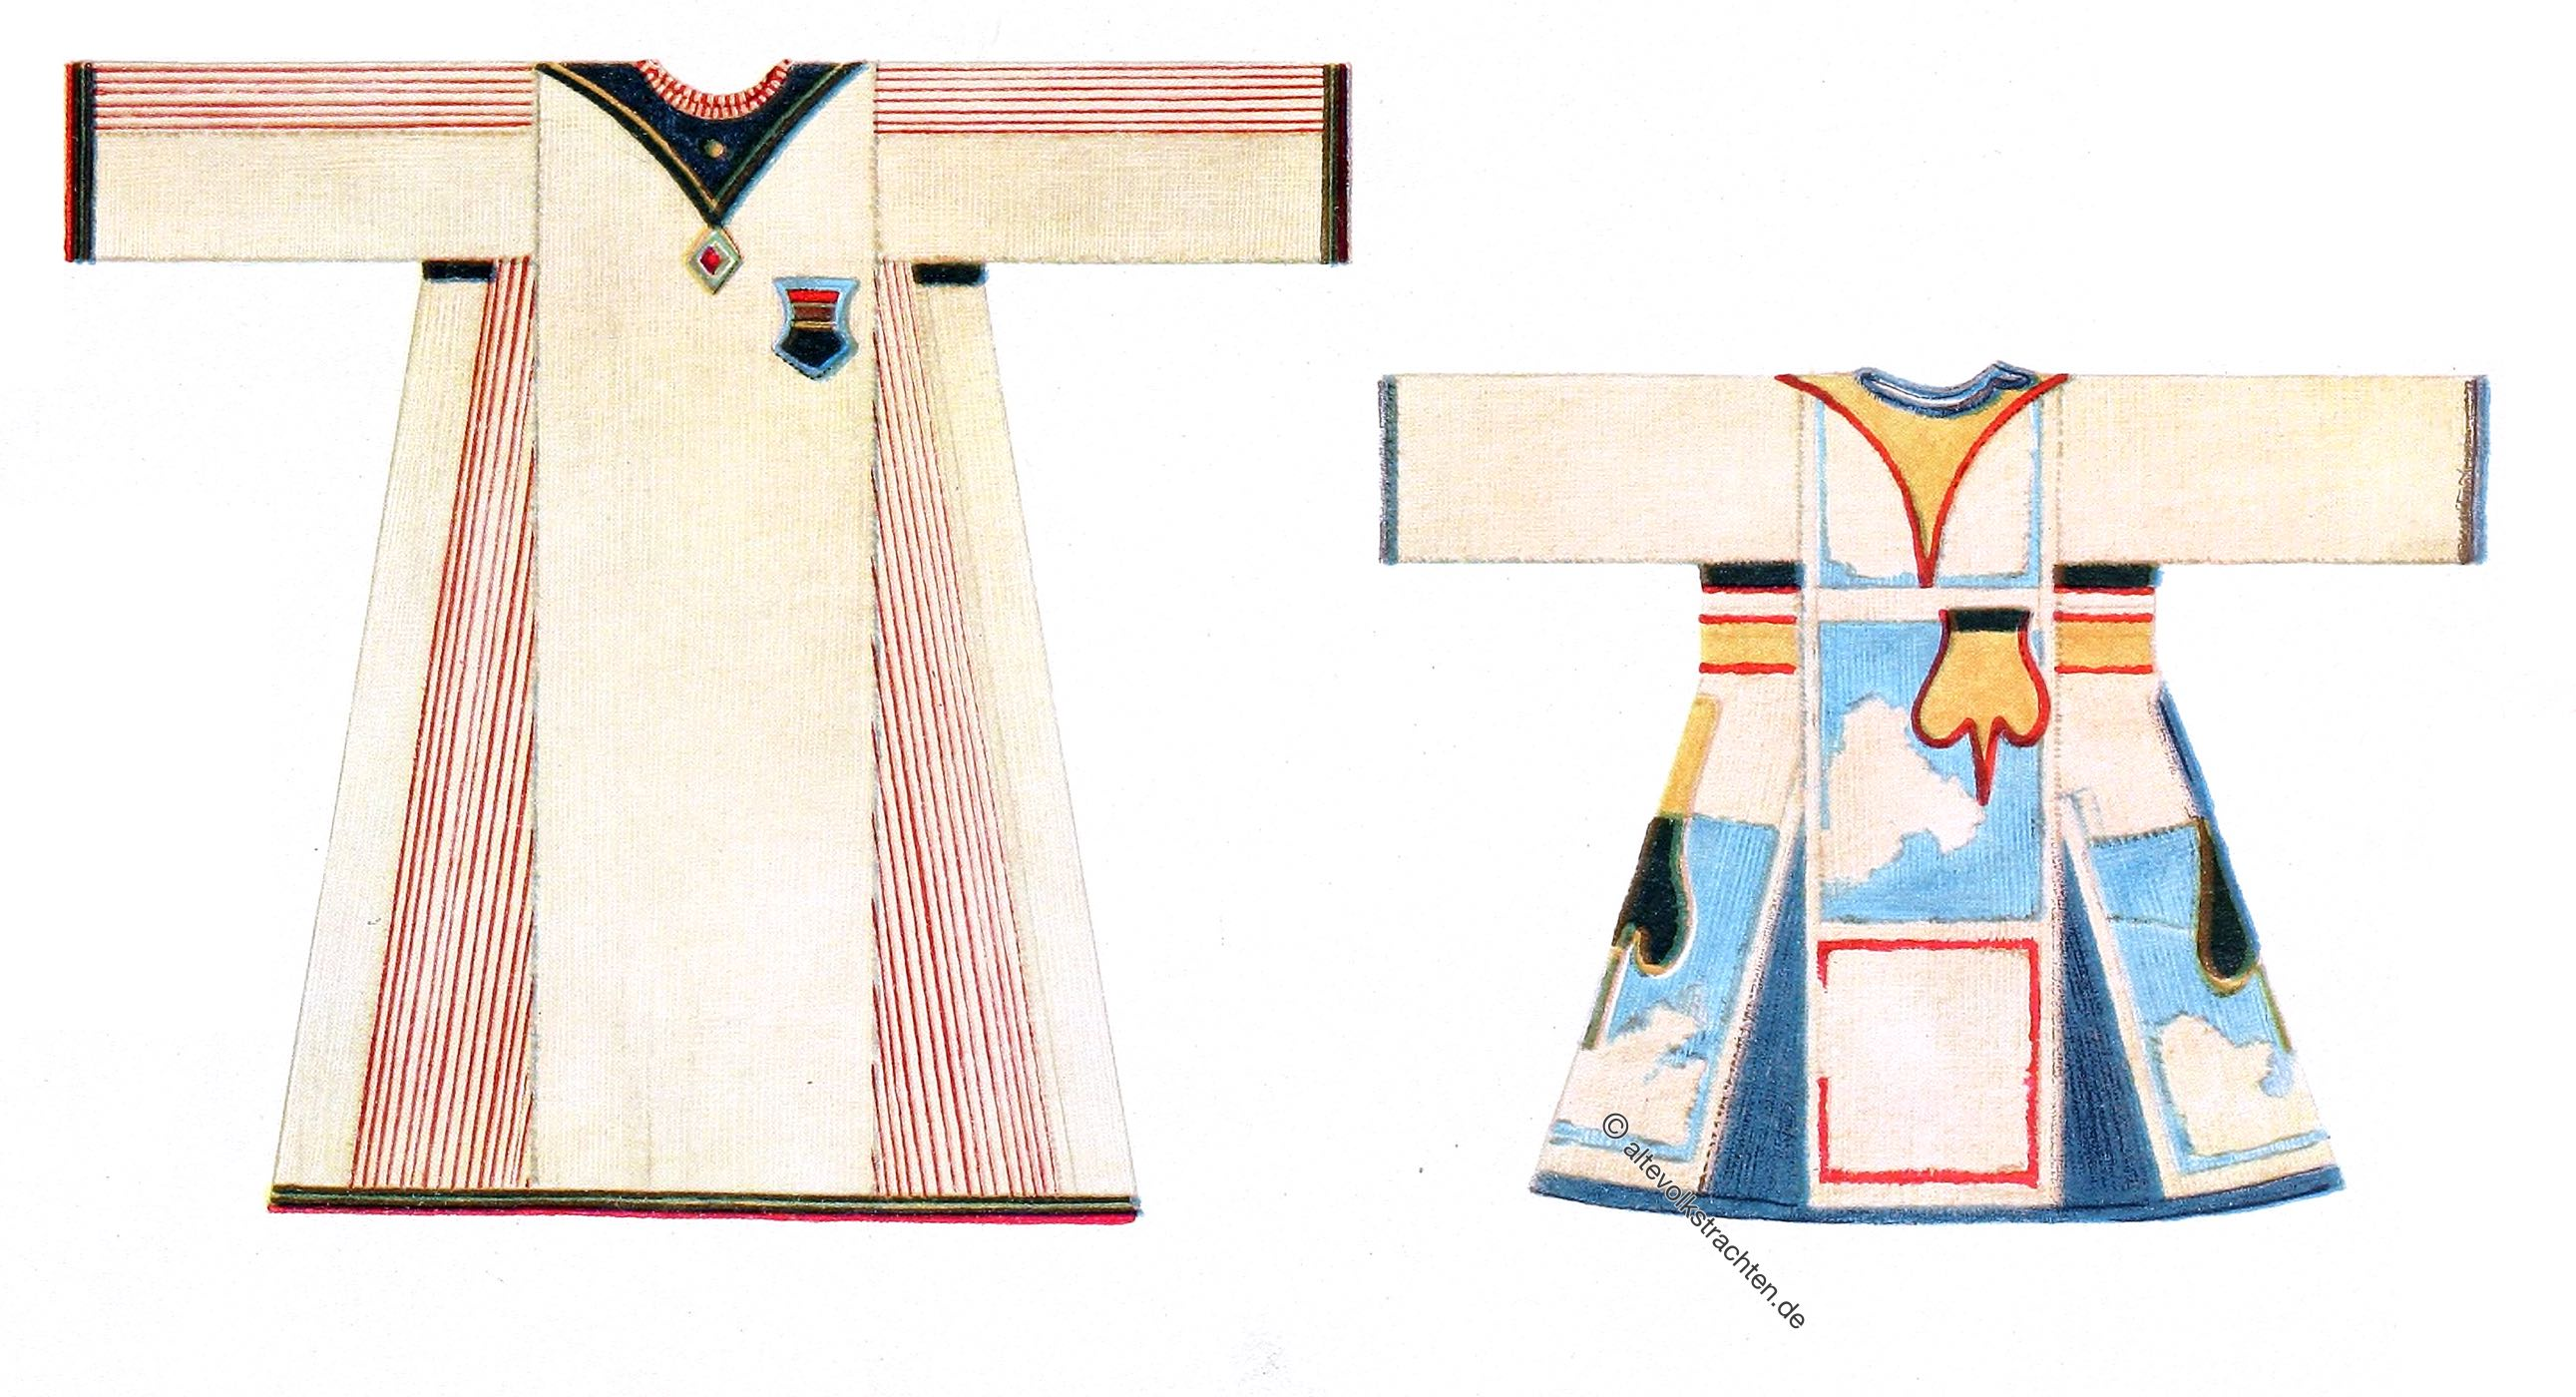 Max Tilke, Kostüm, Kleidung, Kriegerbluse, Omdurman, Sudan, Afrika.